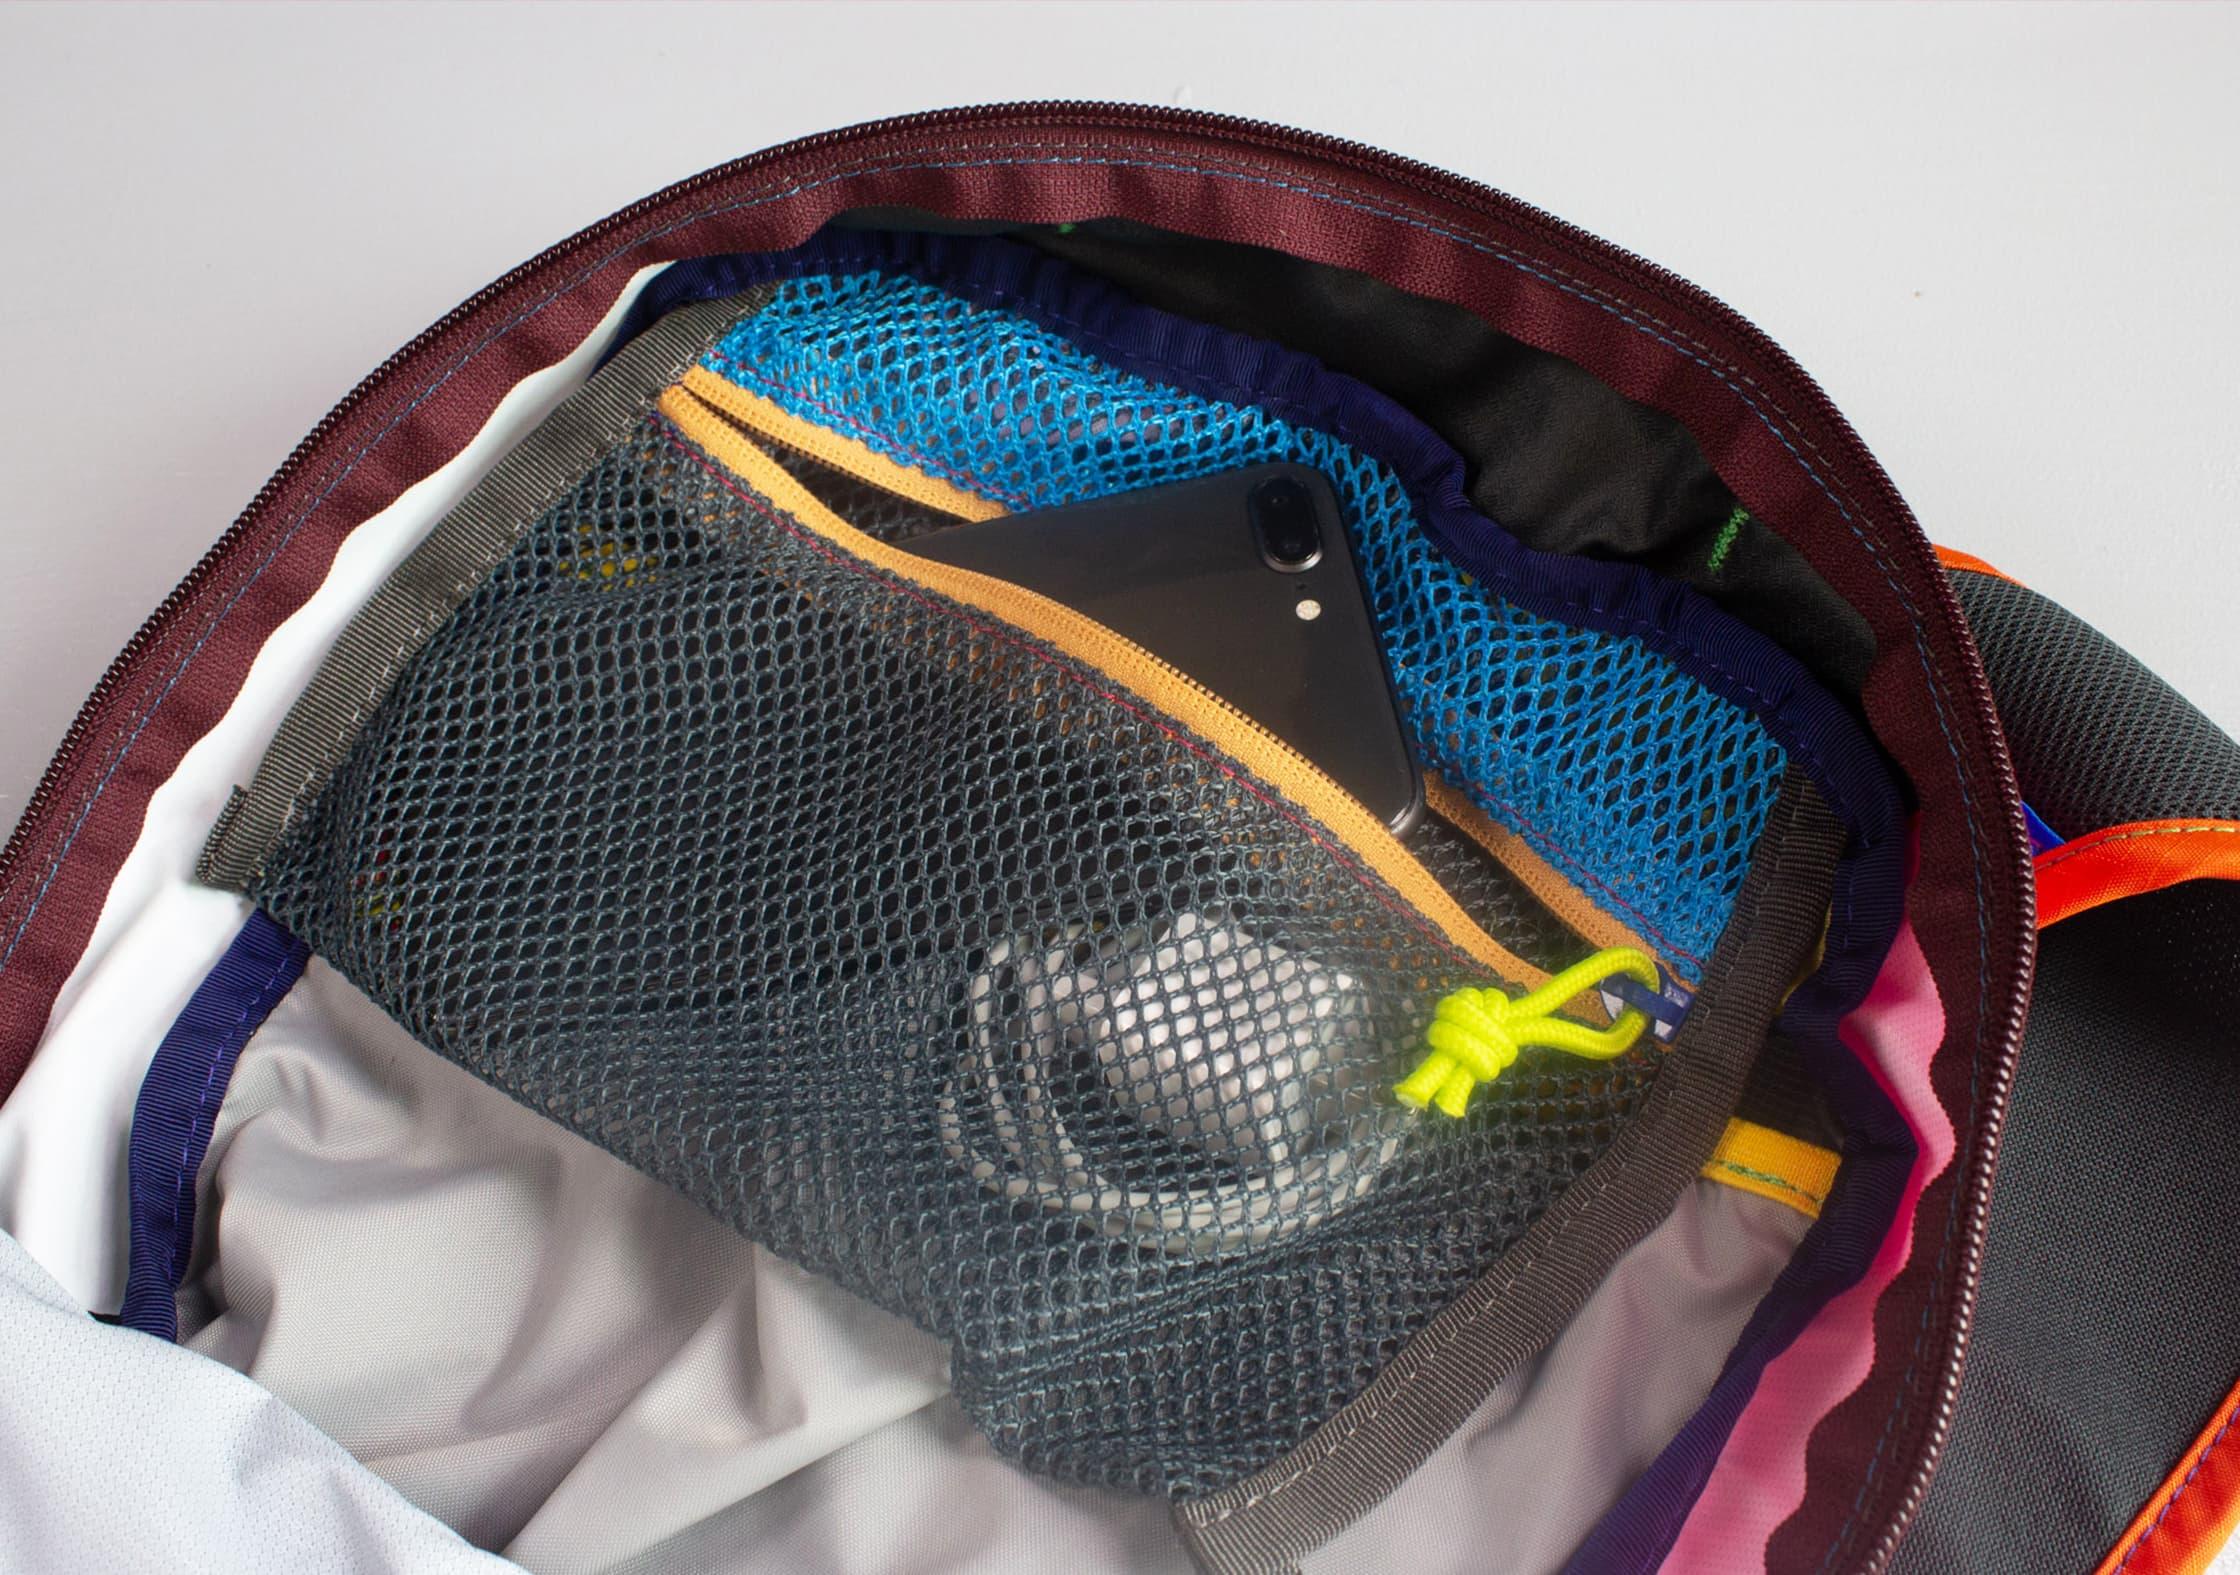 Cotopaxi Batac Small Interior Pocket